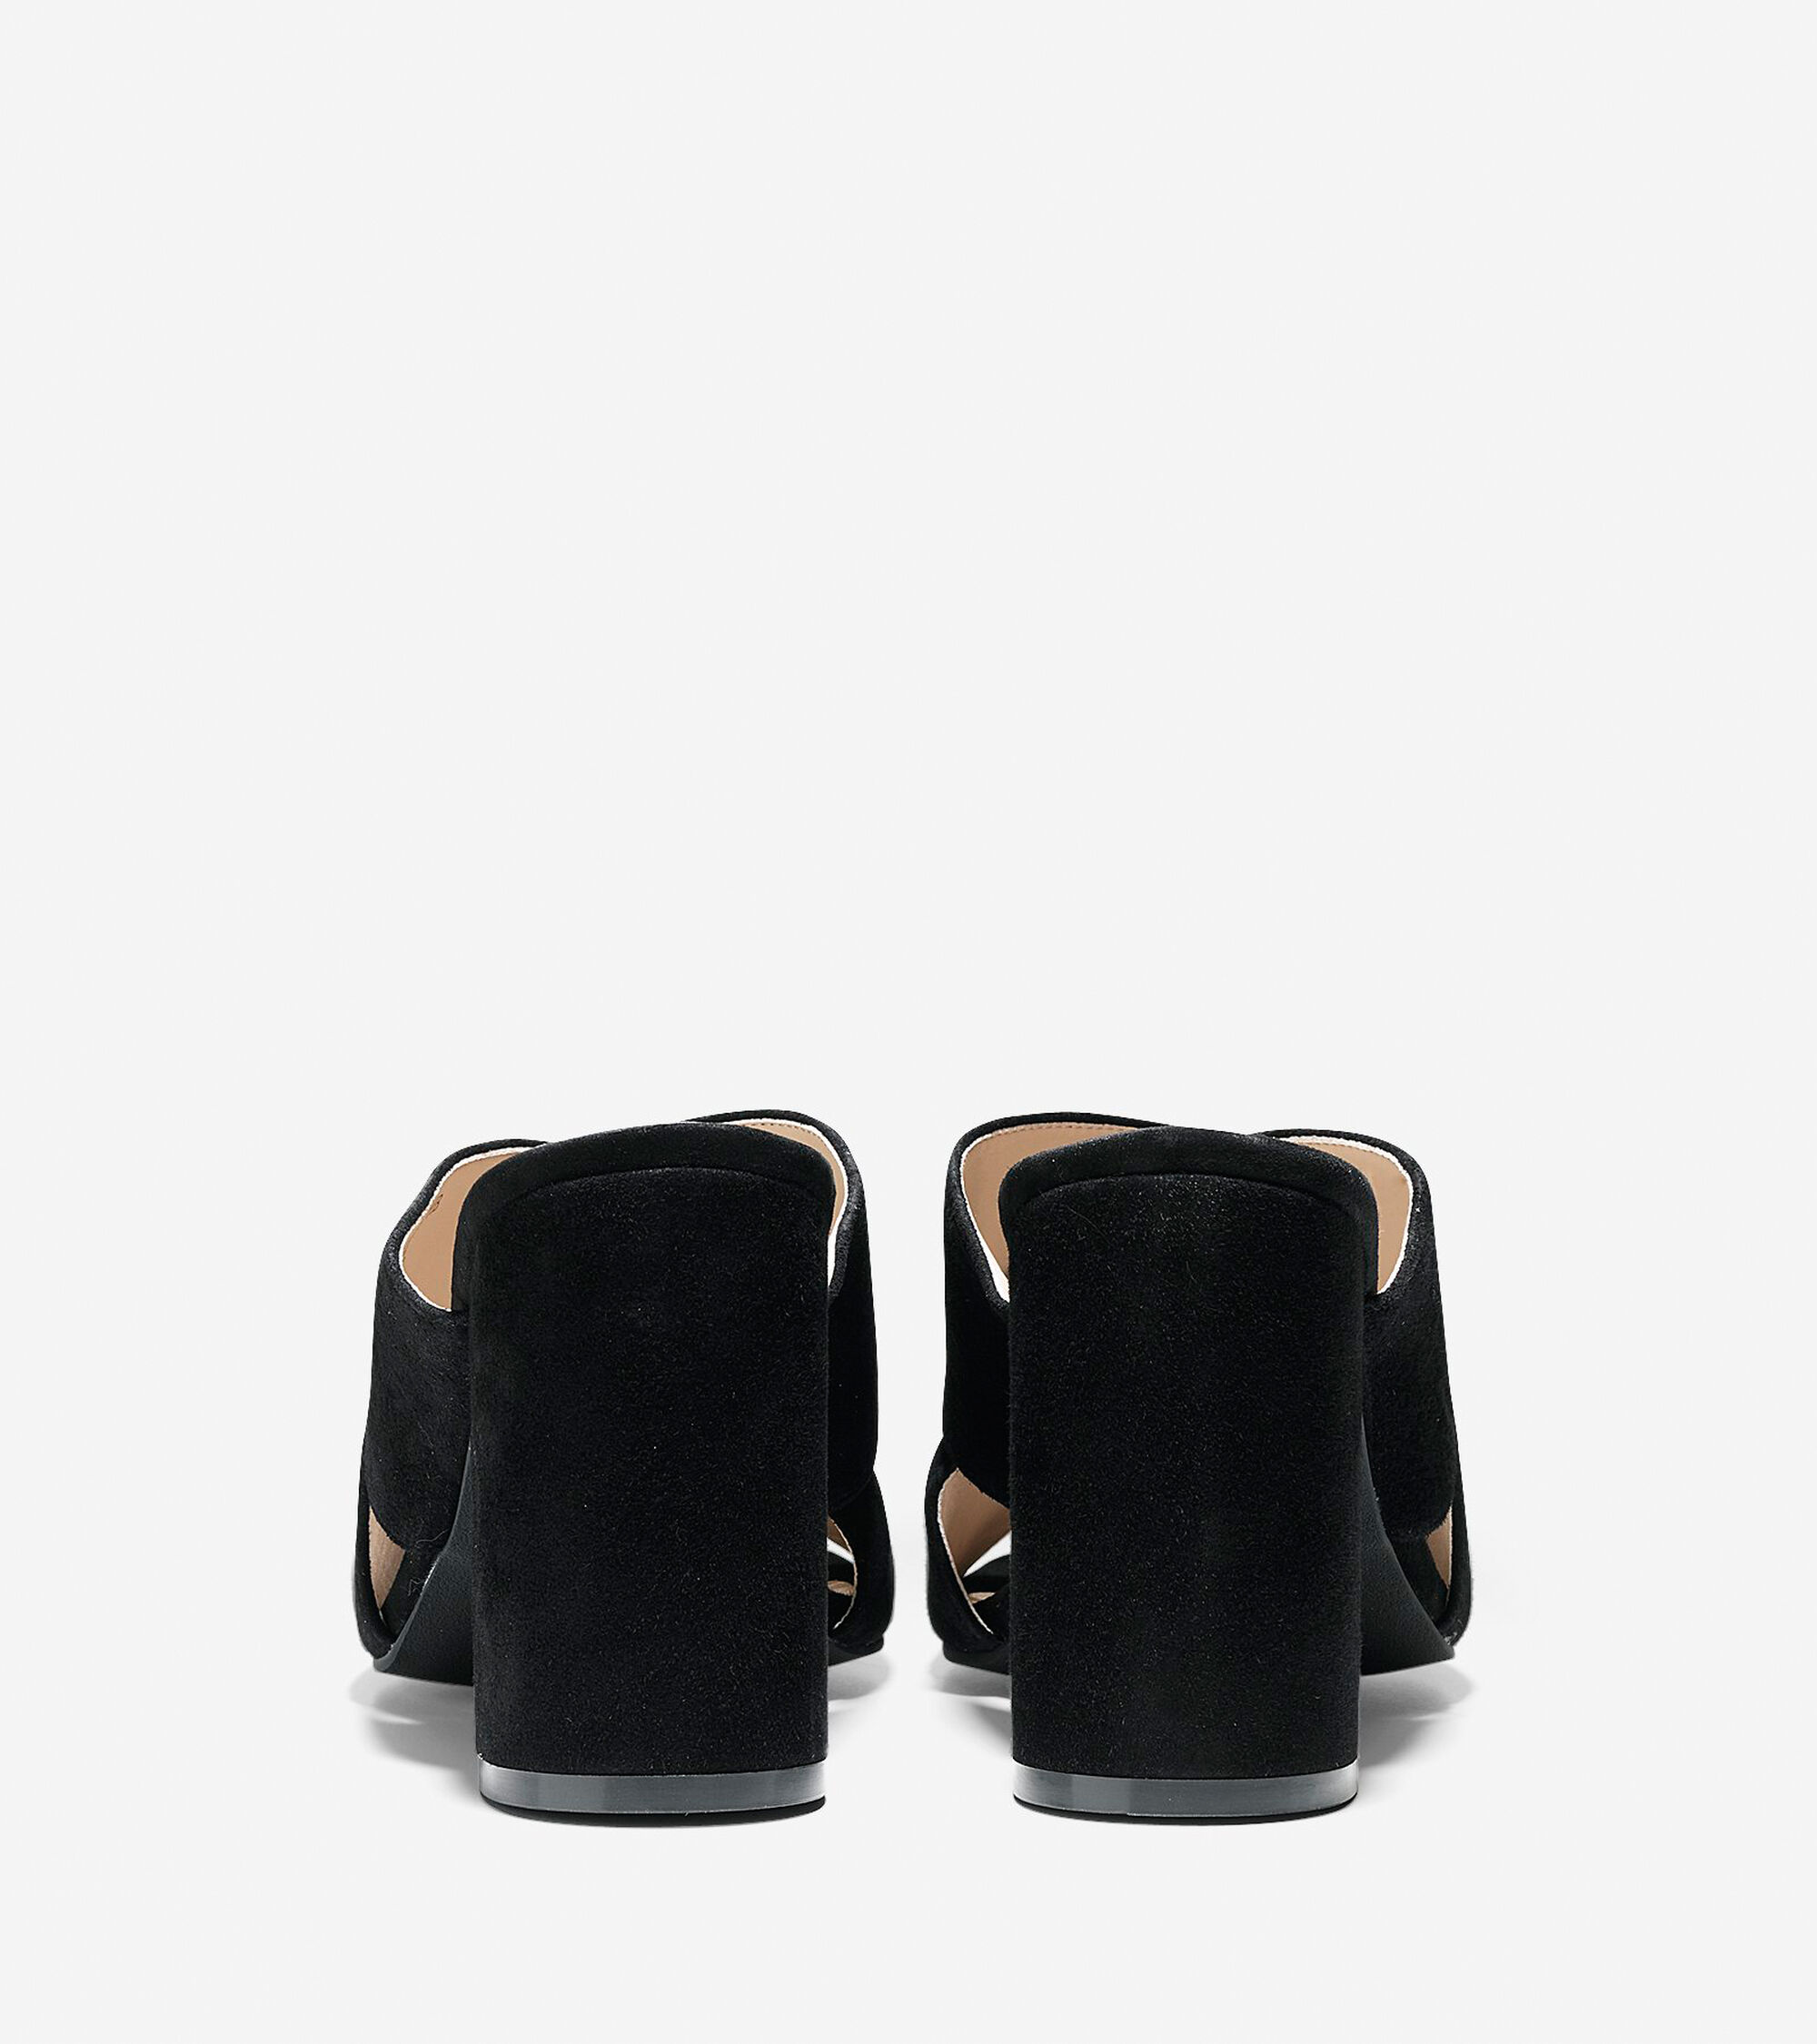 Womens sandals reviews -  Gabby Sandal 85mm